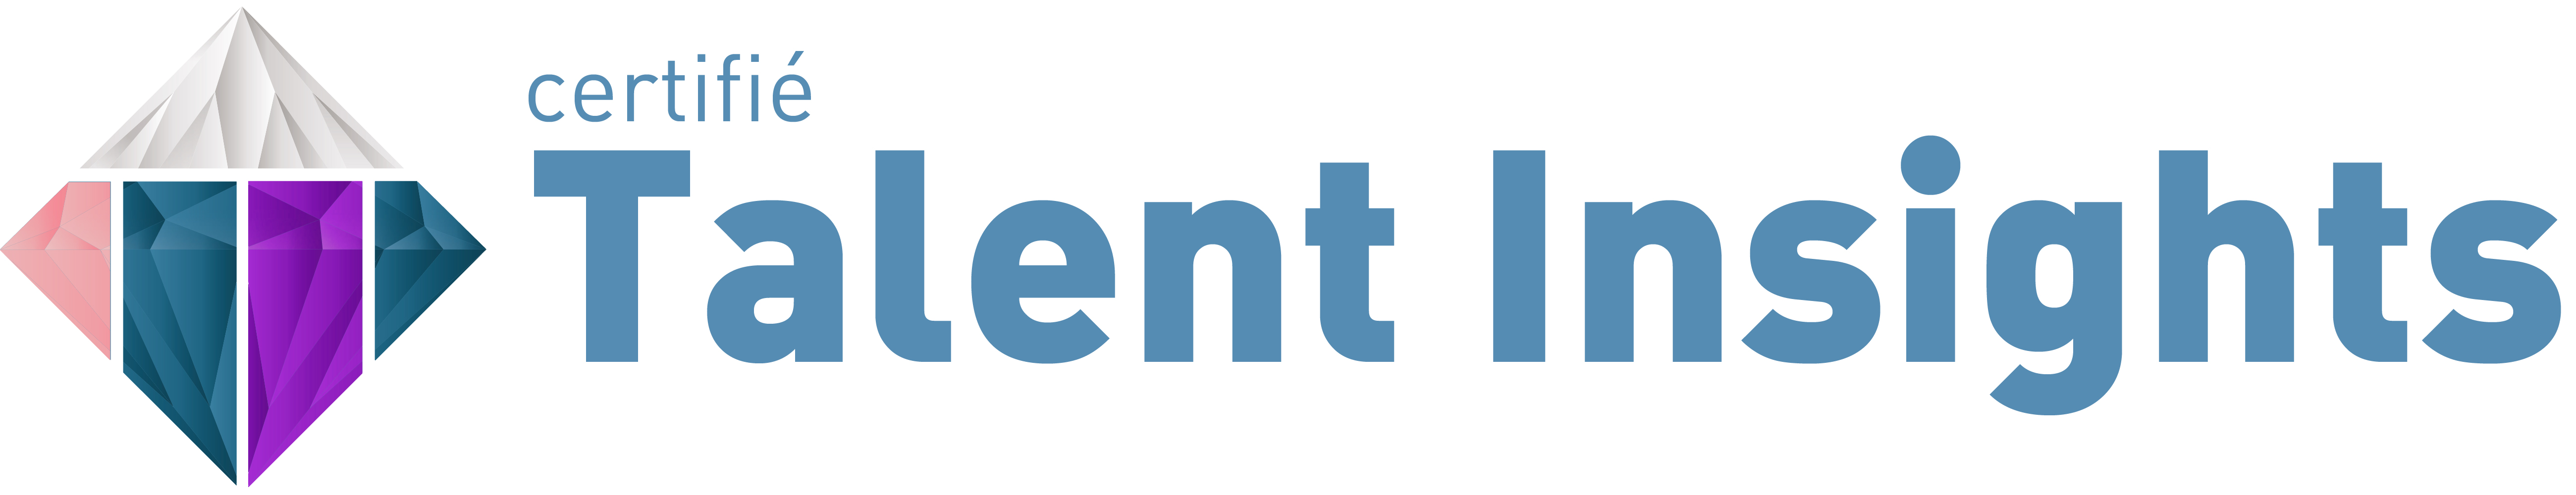 Certifié Talent Insights